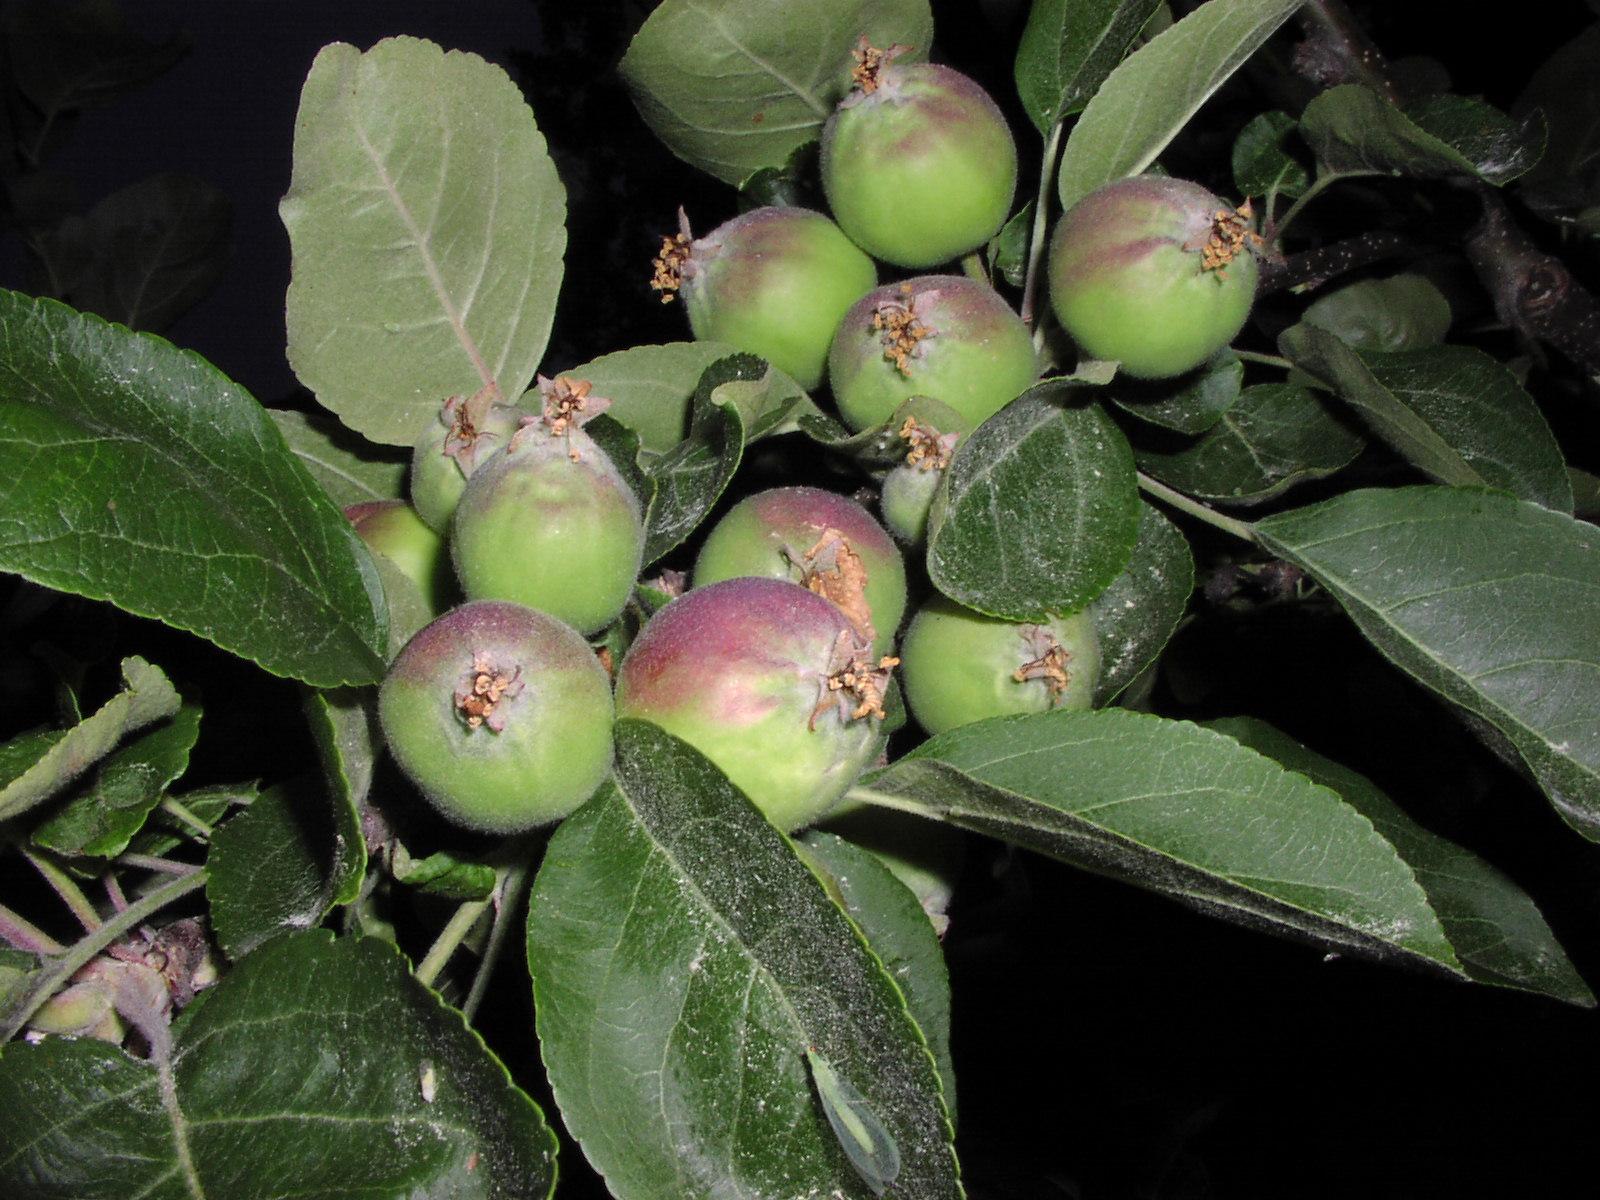 omenan raakileharvennus Entti2